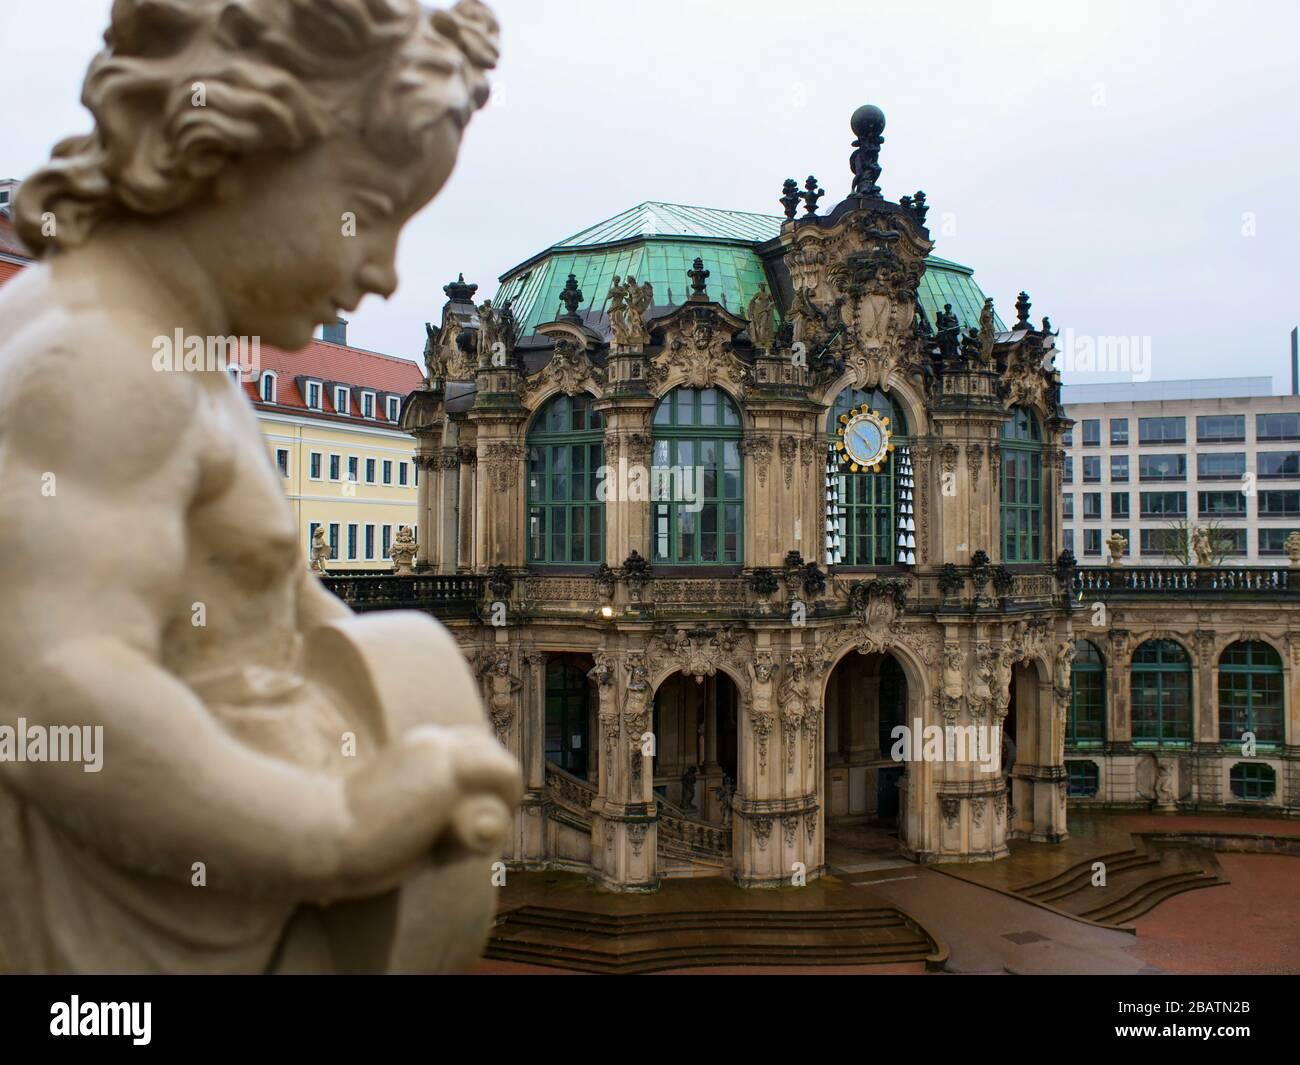 Dresden Zwinger während Coronavirus Lockdown 2020 Glockenspielpavillon Innenhof in der dresdner Altstadt Sehenswürdigkeit bei Regen Foto de stock